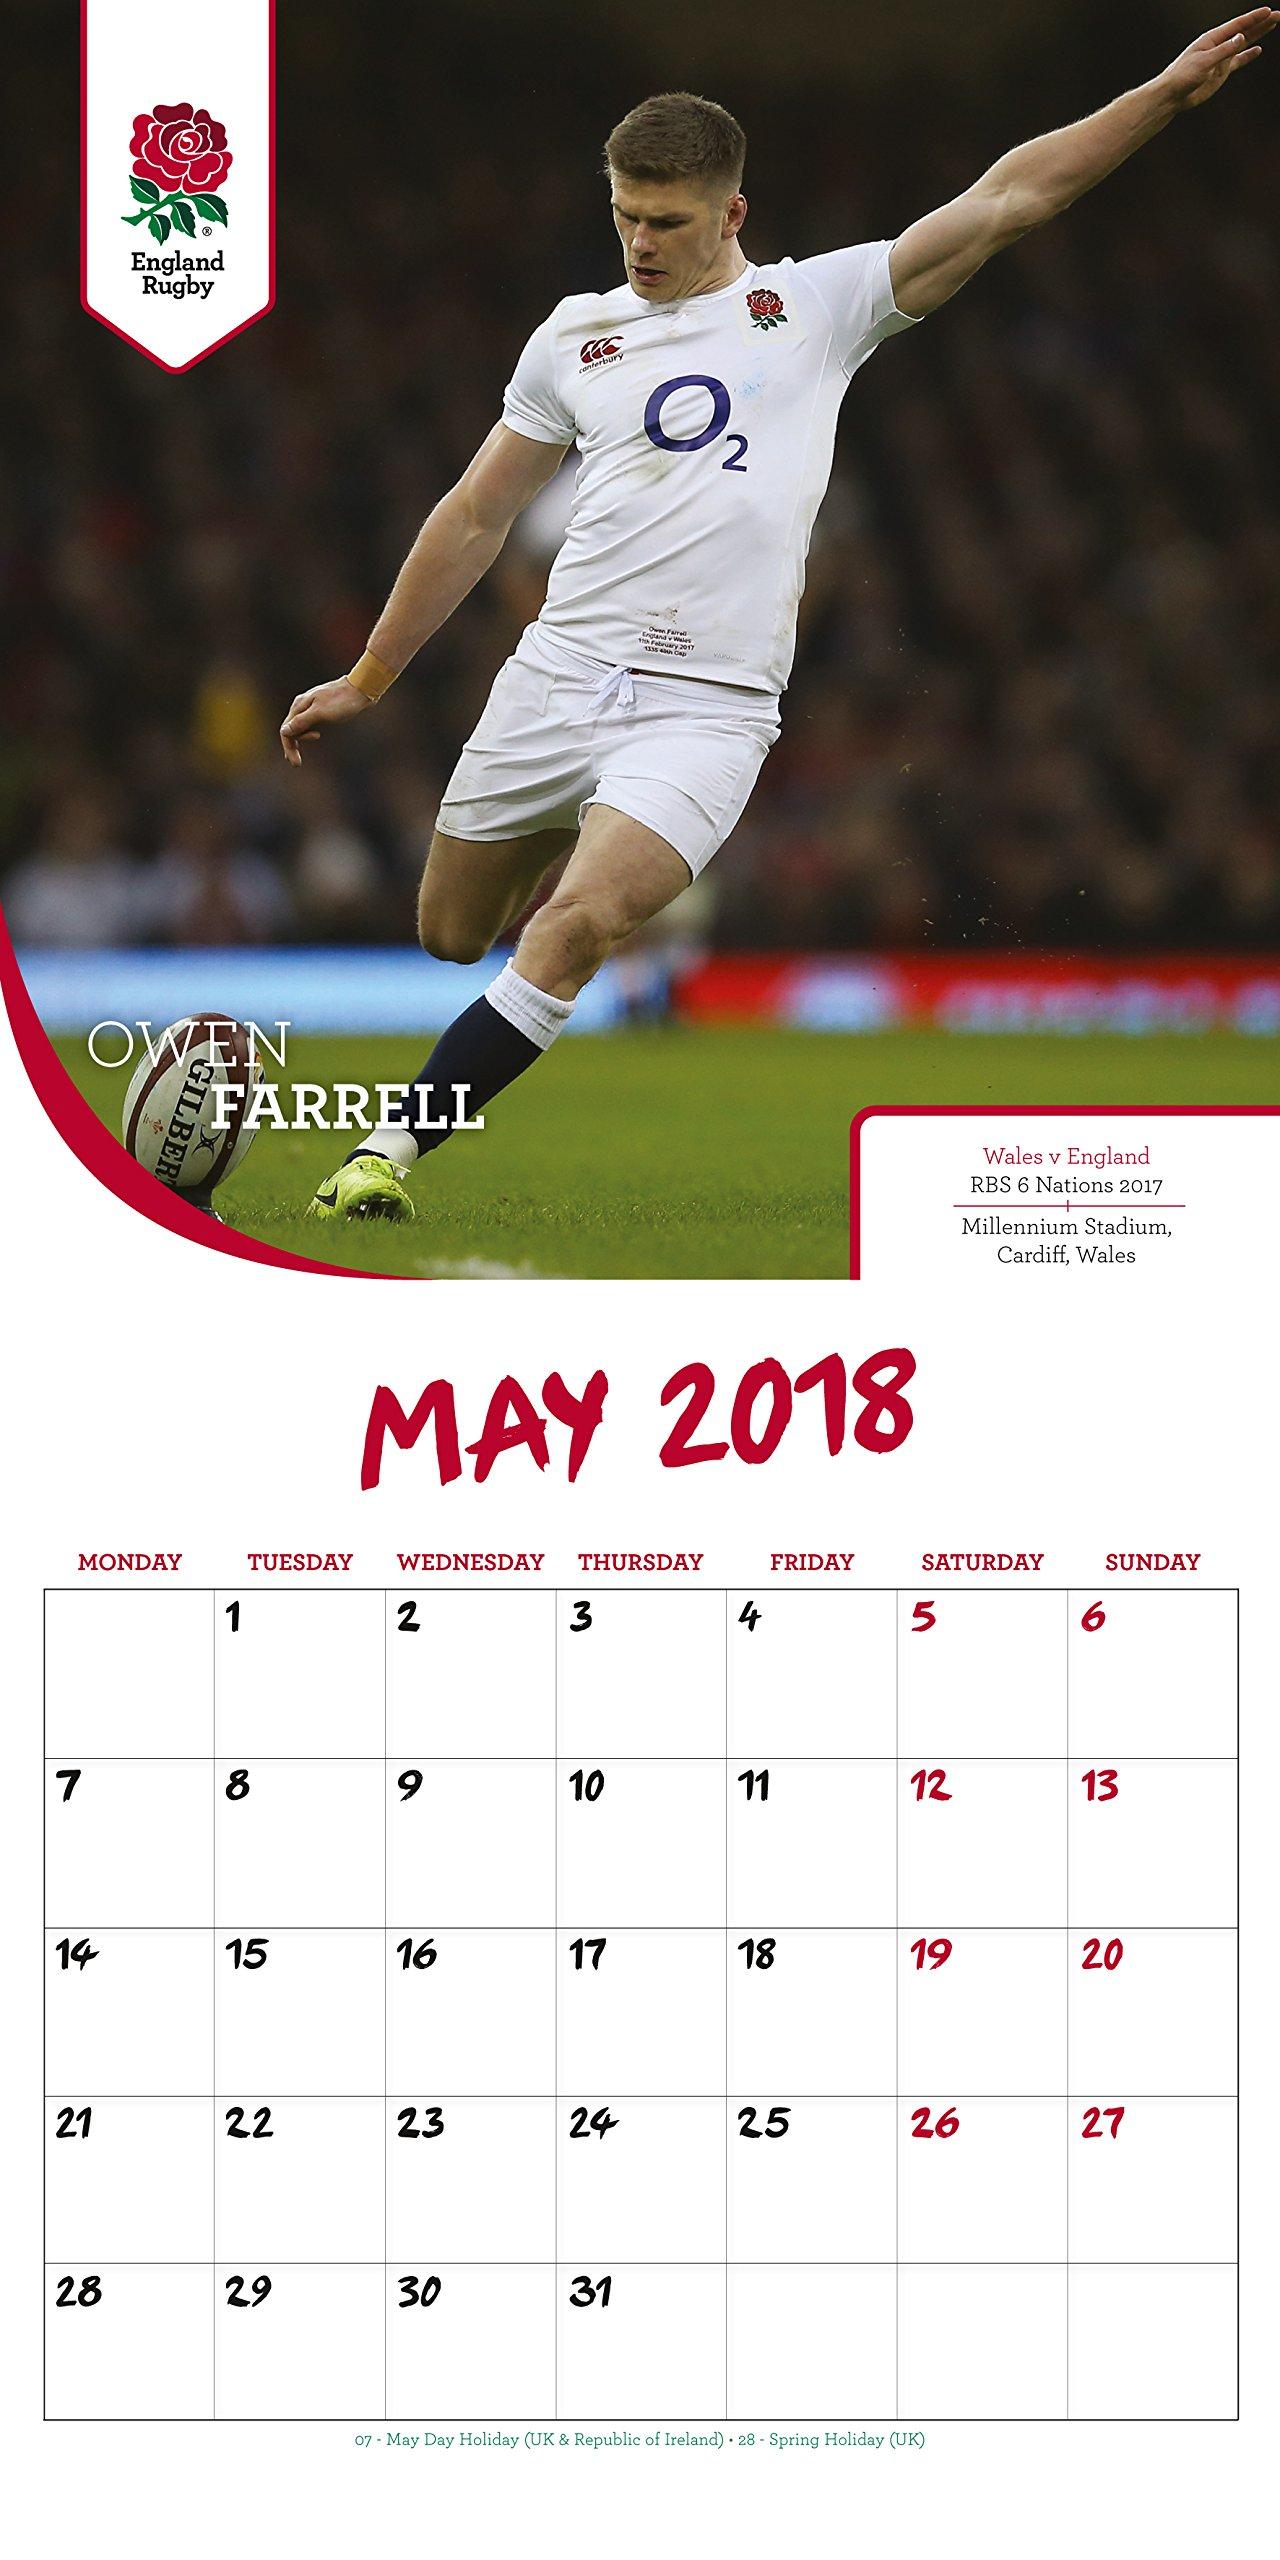 63e16eb834c England Rugby Union Official 2018 Calendar - Square Wall Format Calendar  Calendar 2018: Amazon.co.uk: England Rugby Union: Books